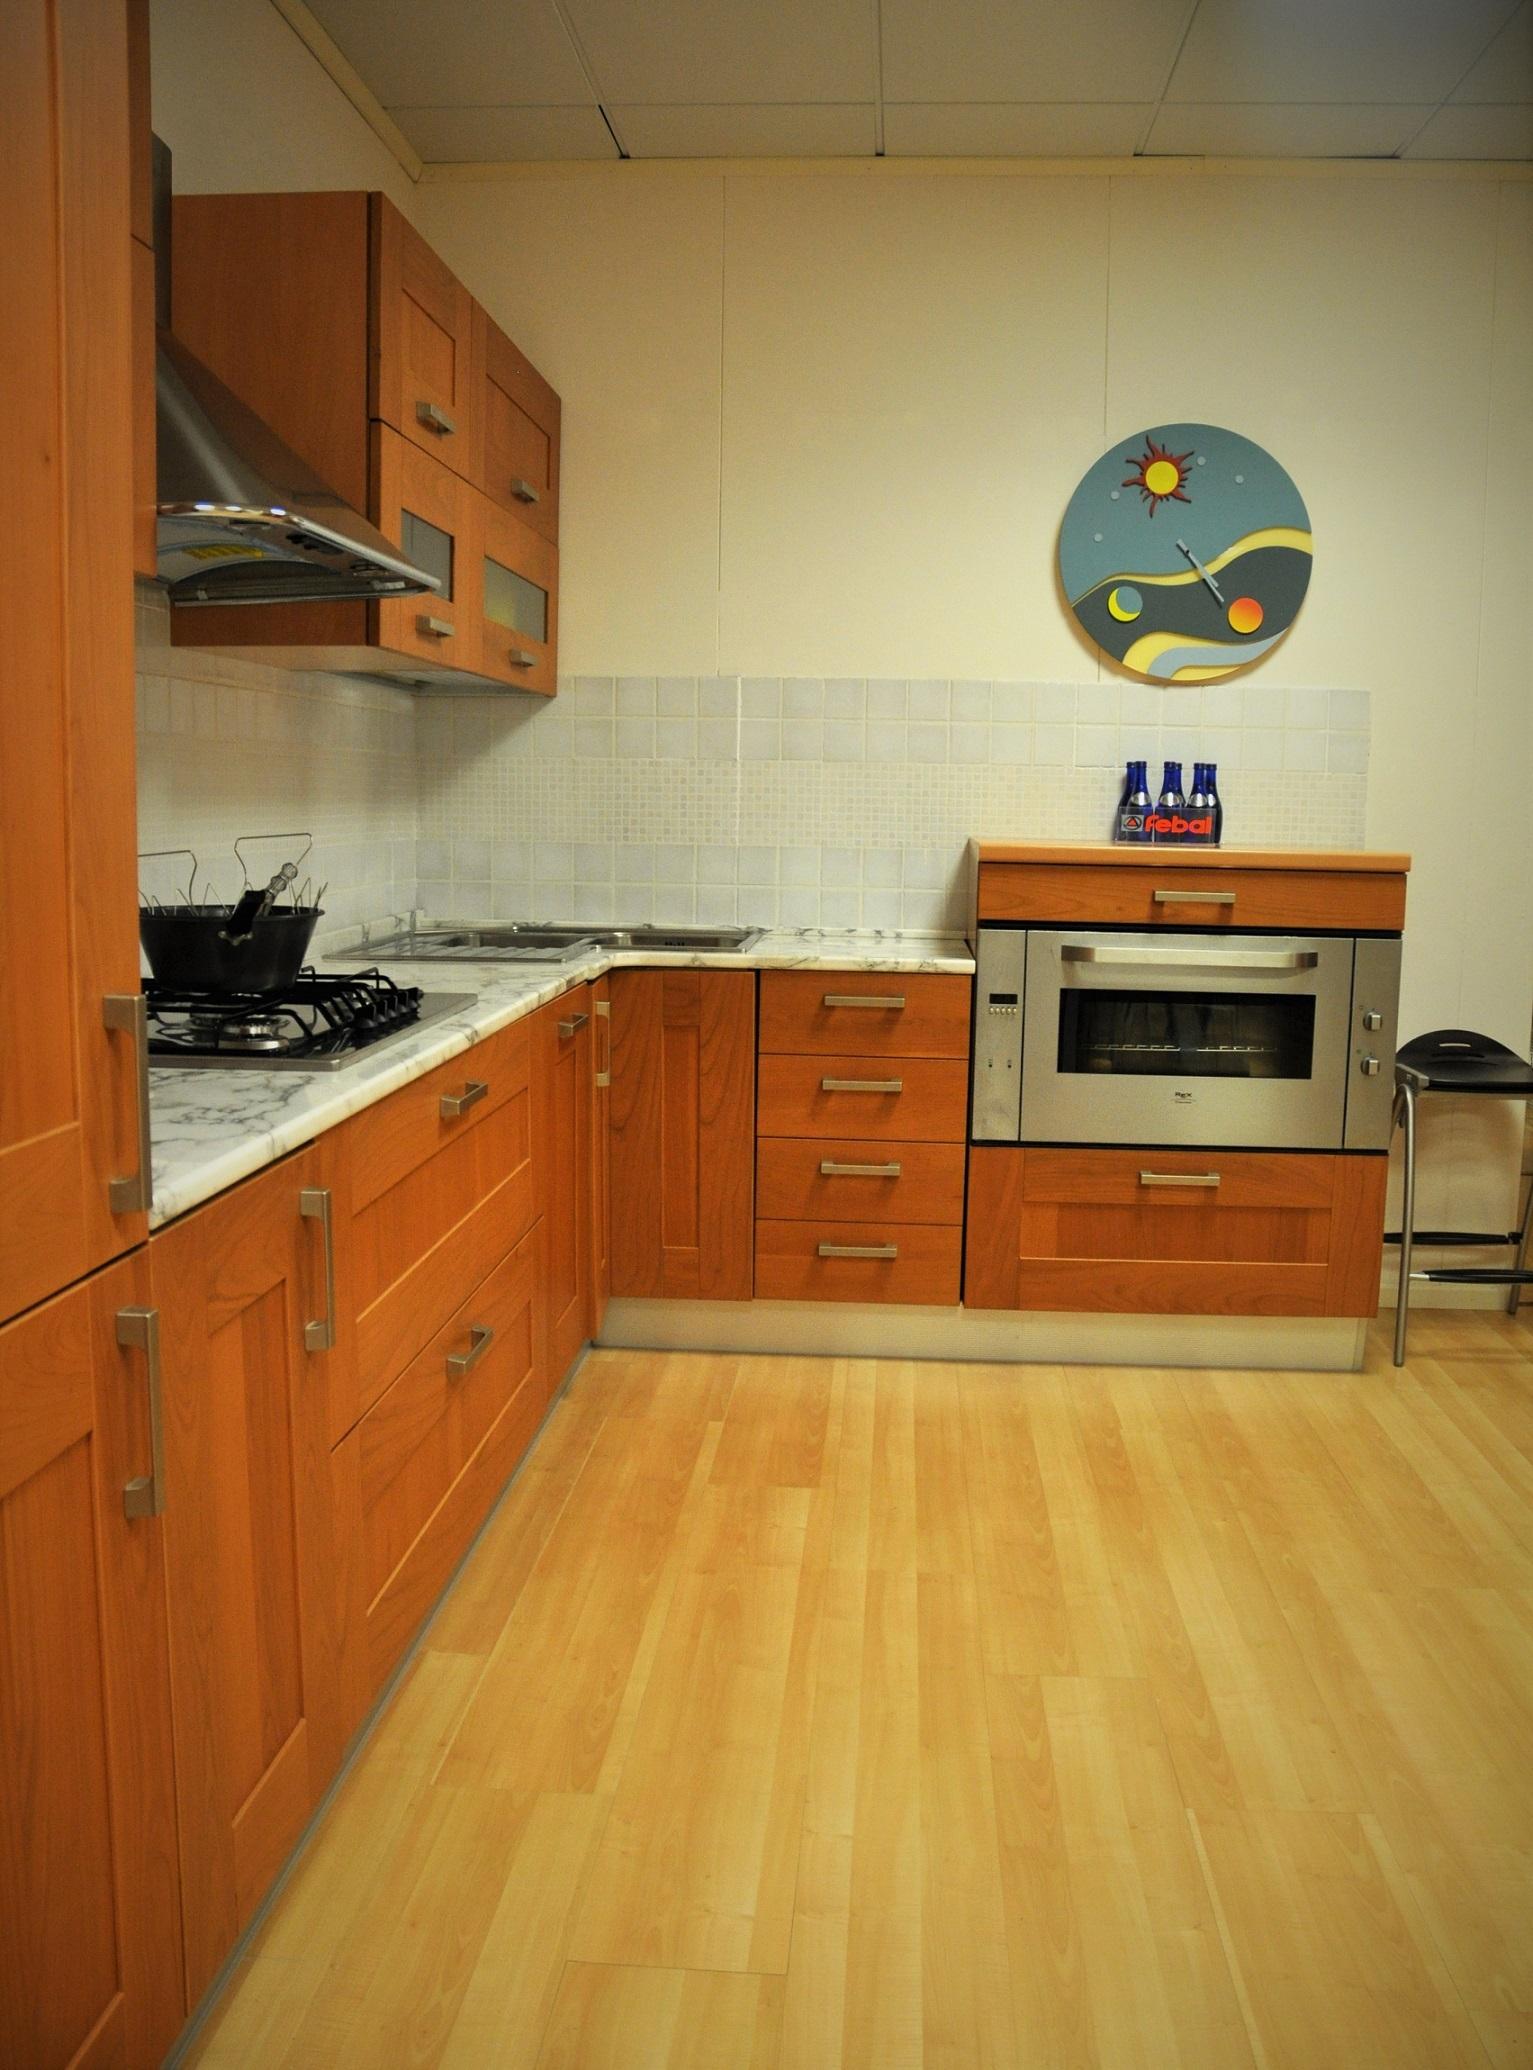 Cucina febal mixer scontato del 60 cucine a prezzi - Mixer da cucina prezzi ...